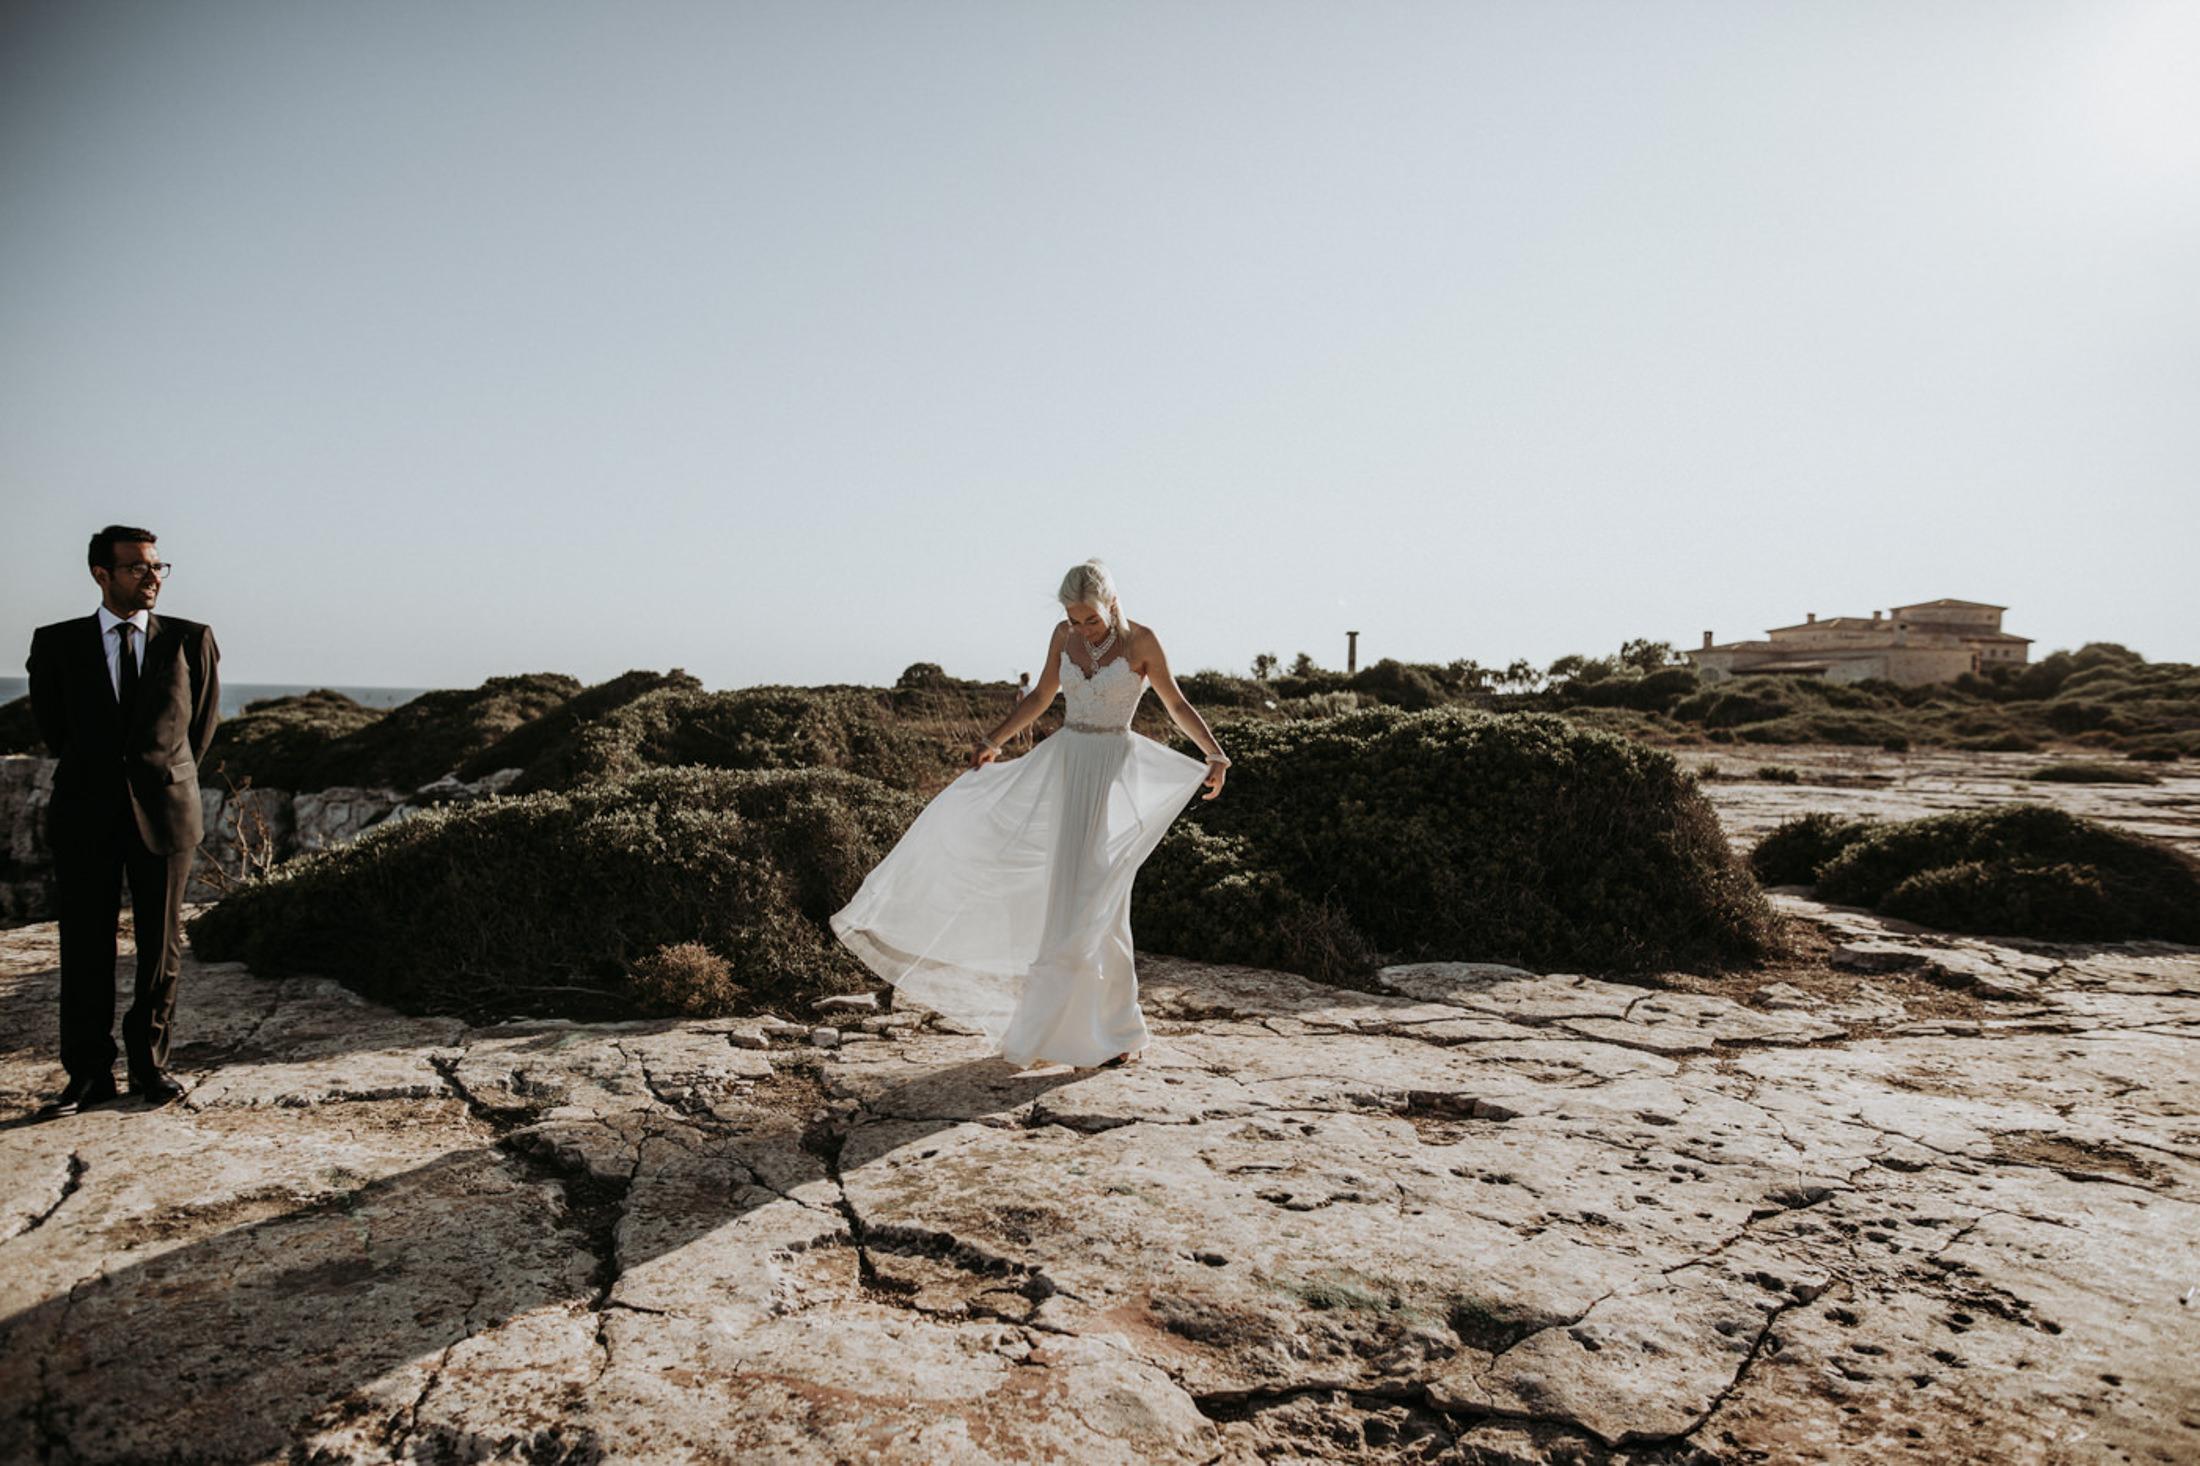 Wedding_Photographer_Mallorca_Daniela-Marquardt_Photography_New_York_Iceland_Tuscany_Santorini_Portugal_Austria_Bavaria_Elopement_Hochzeitsfotograf_AntjeRajat2_86